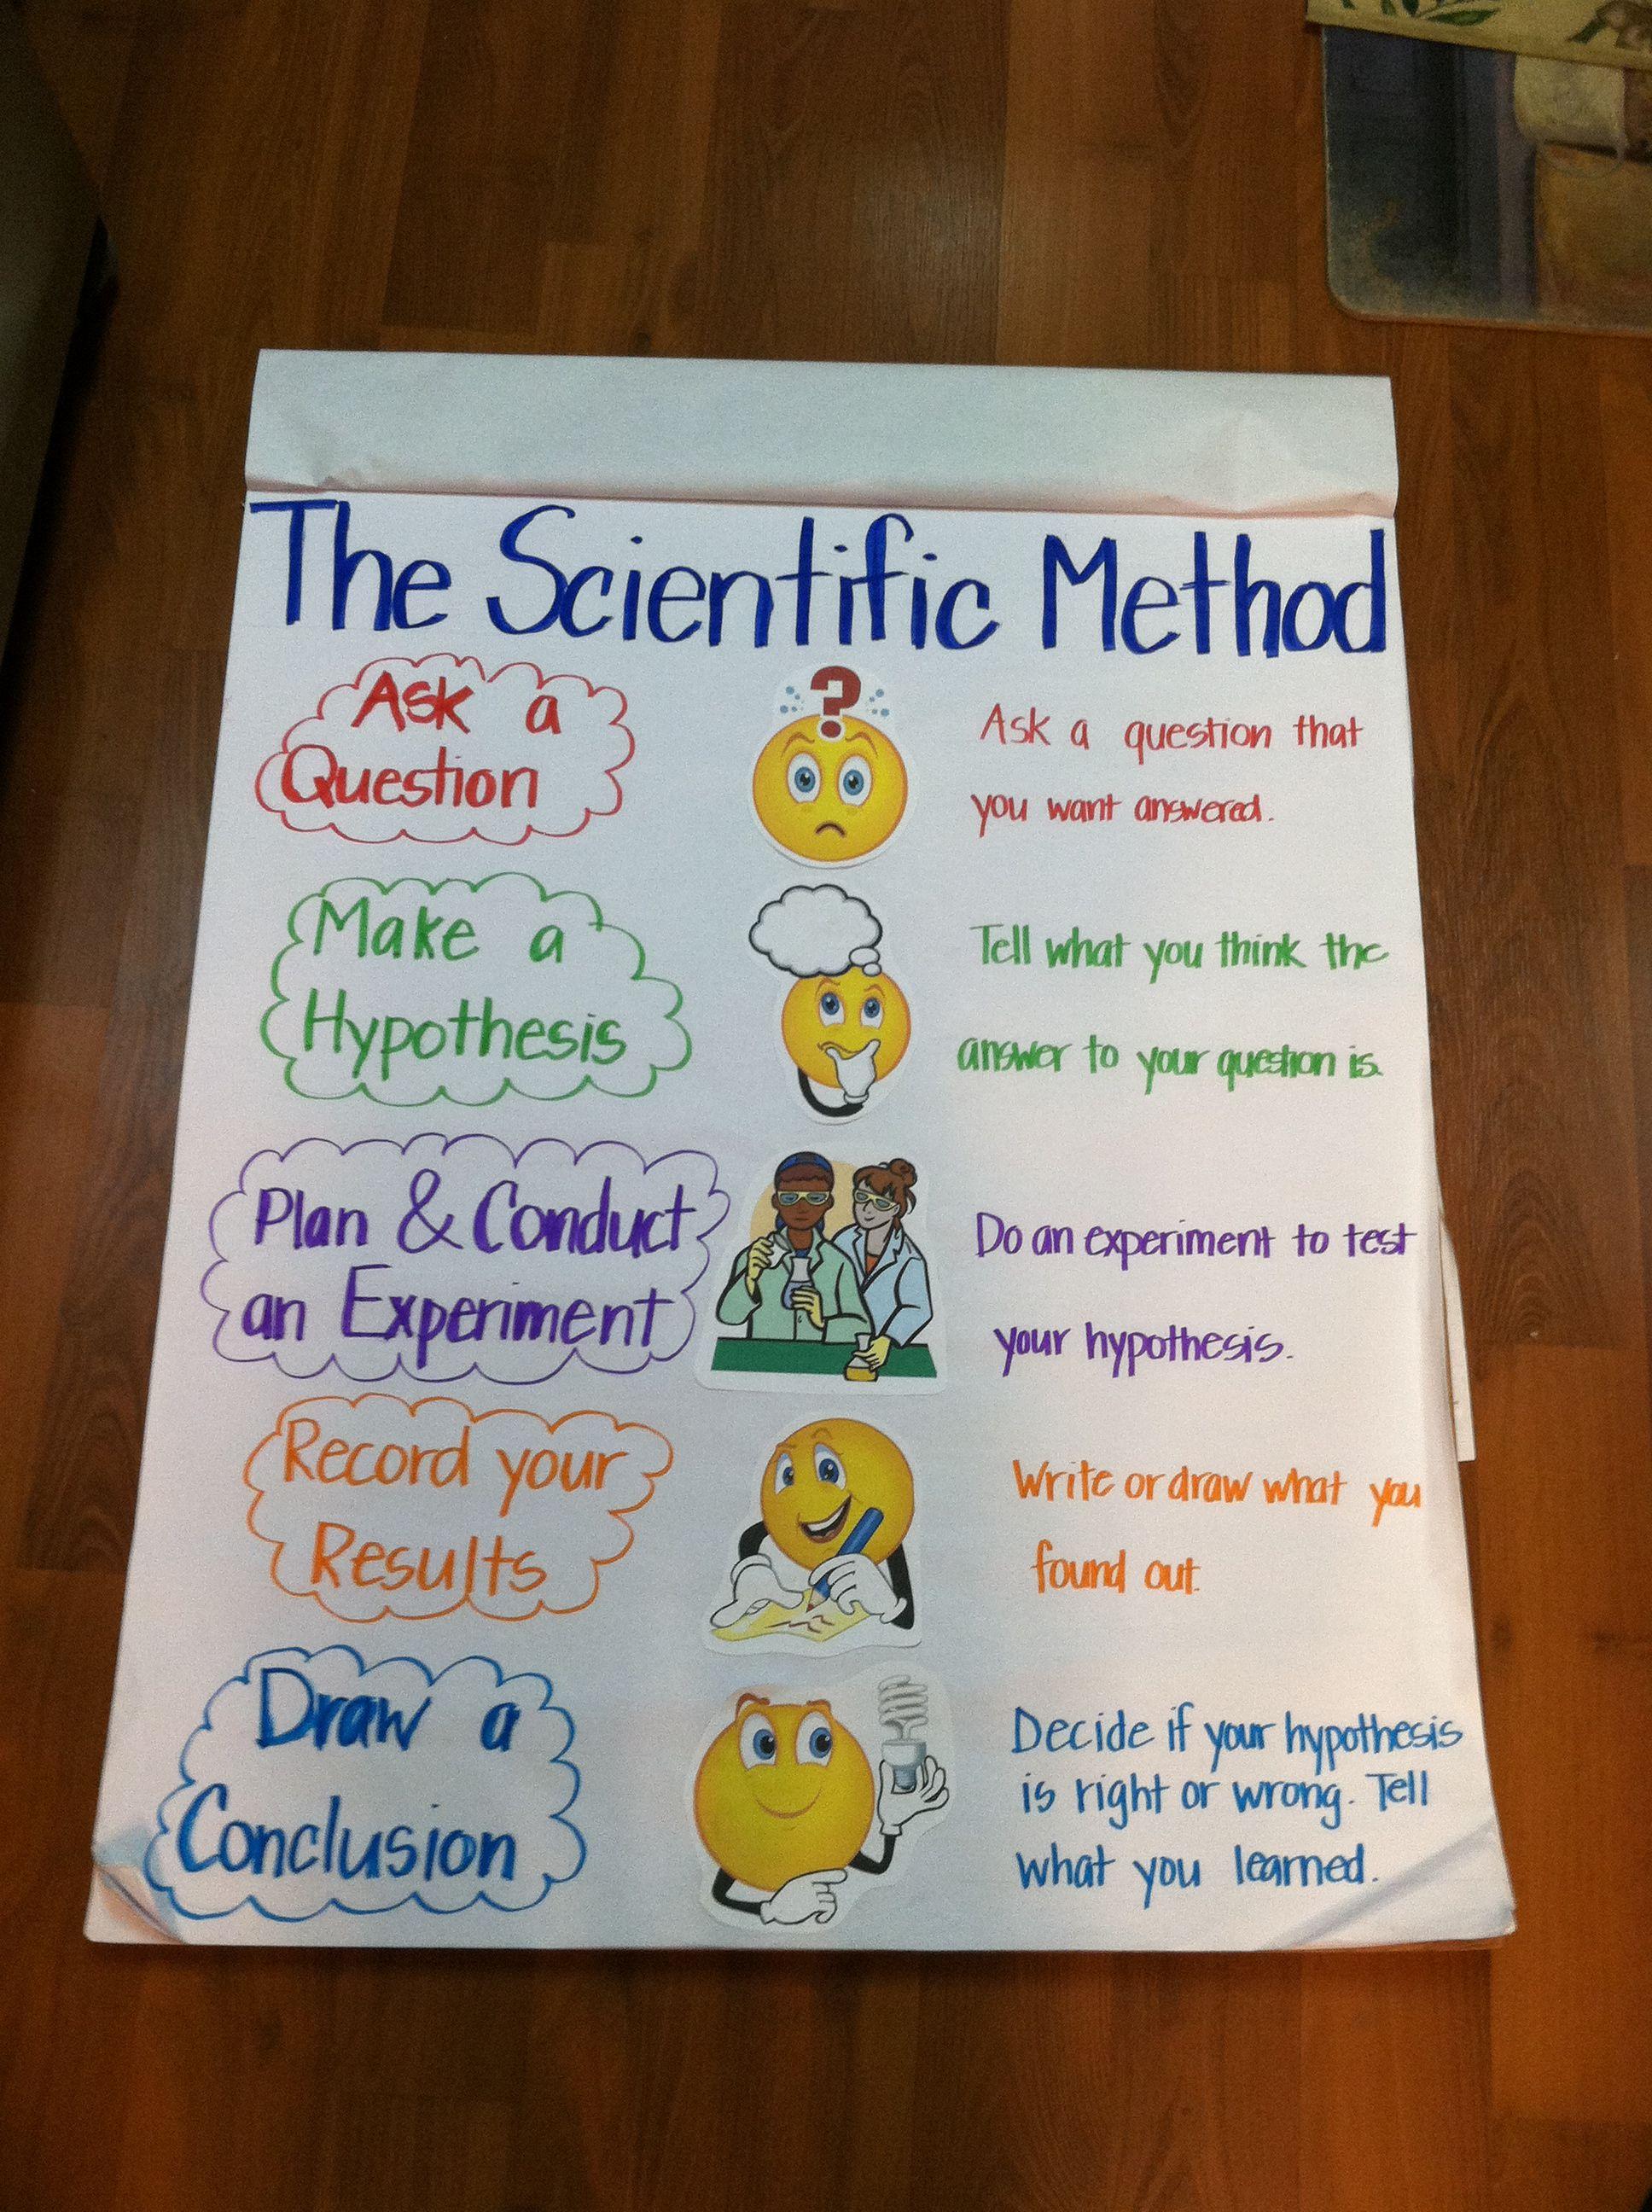 Scientific Method Definition For Kids